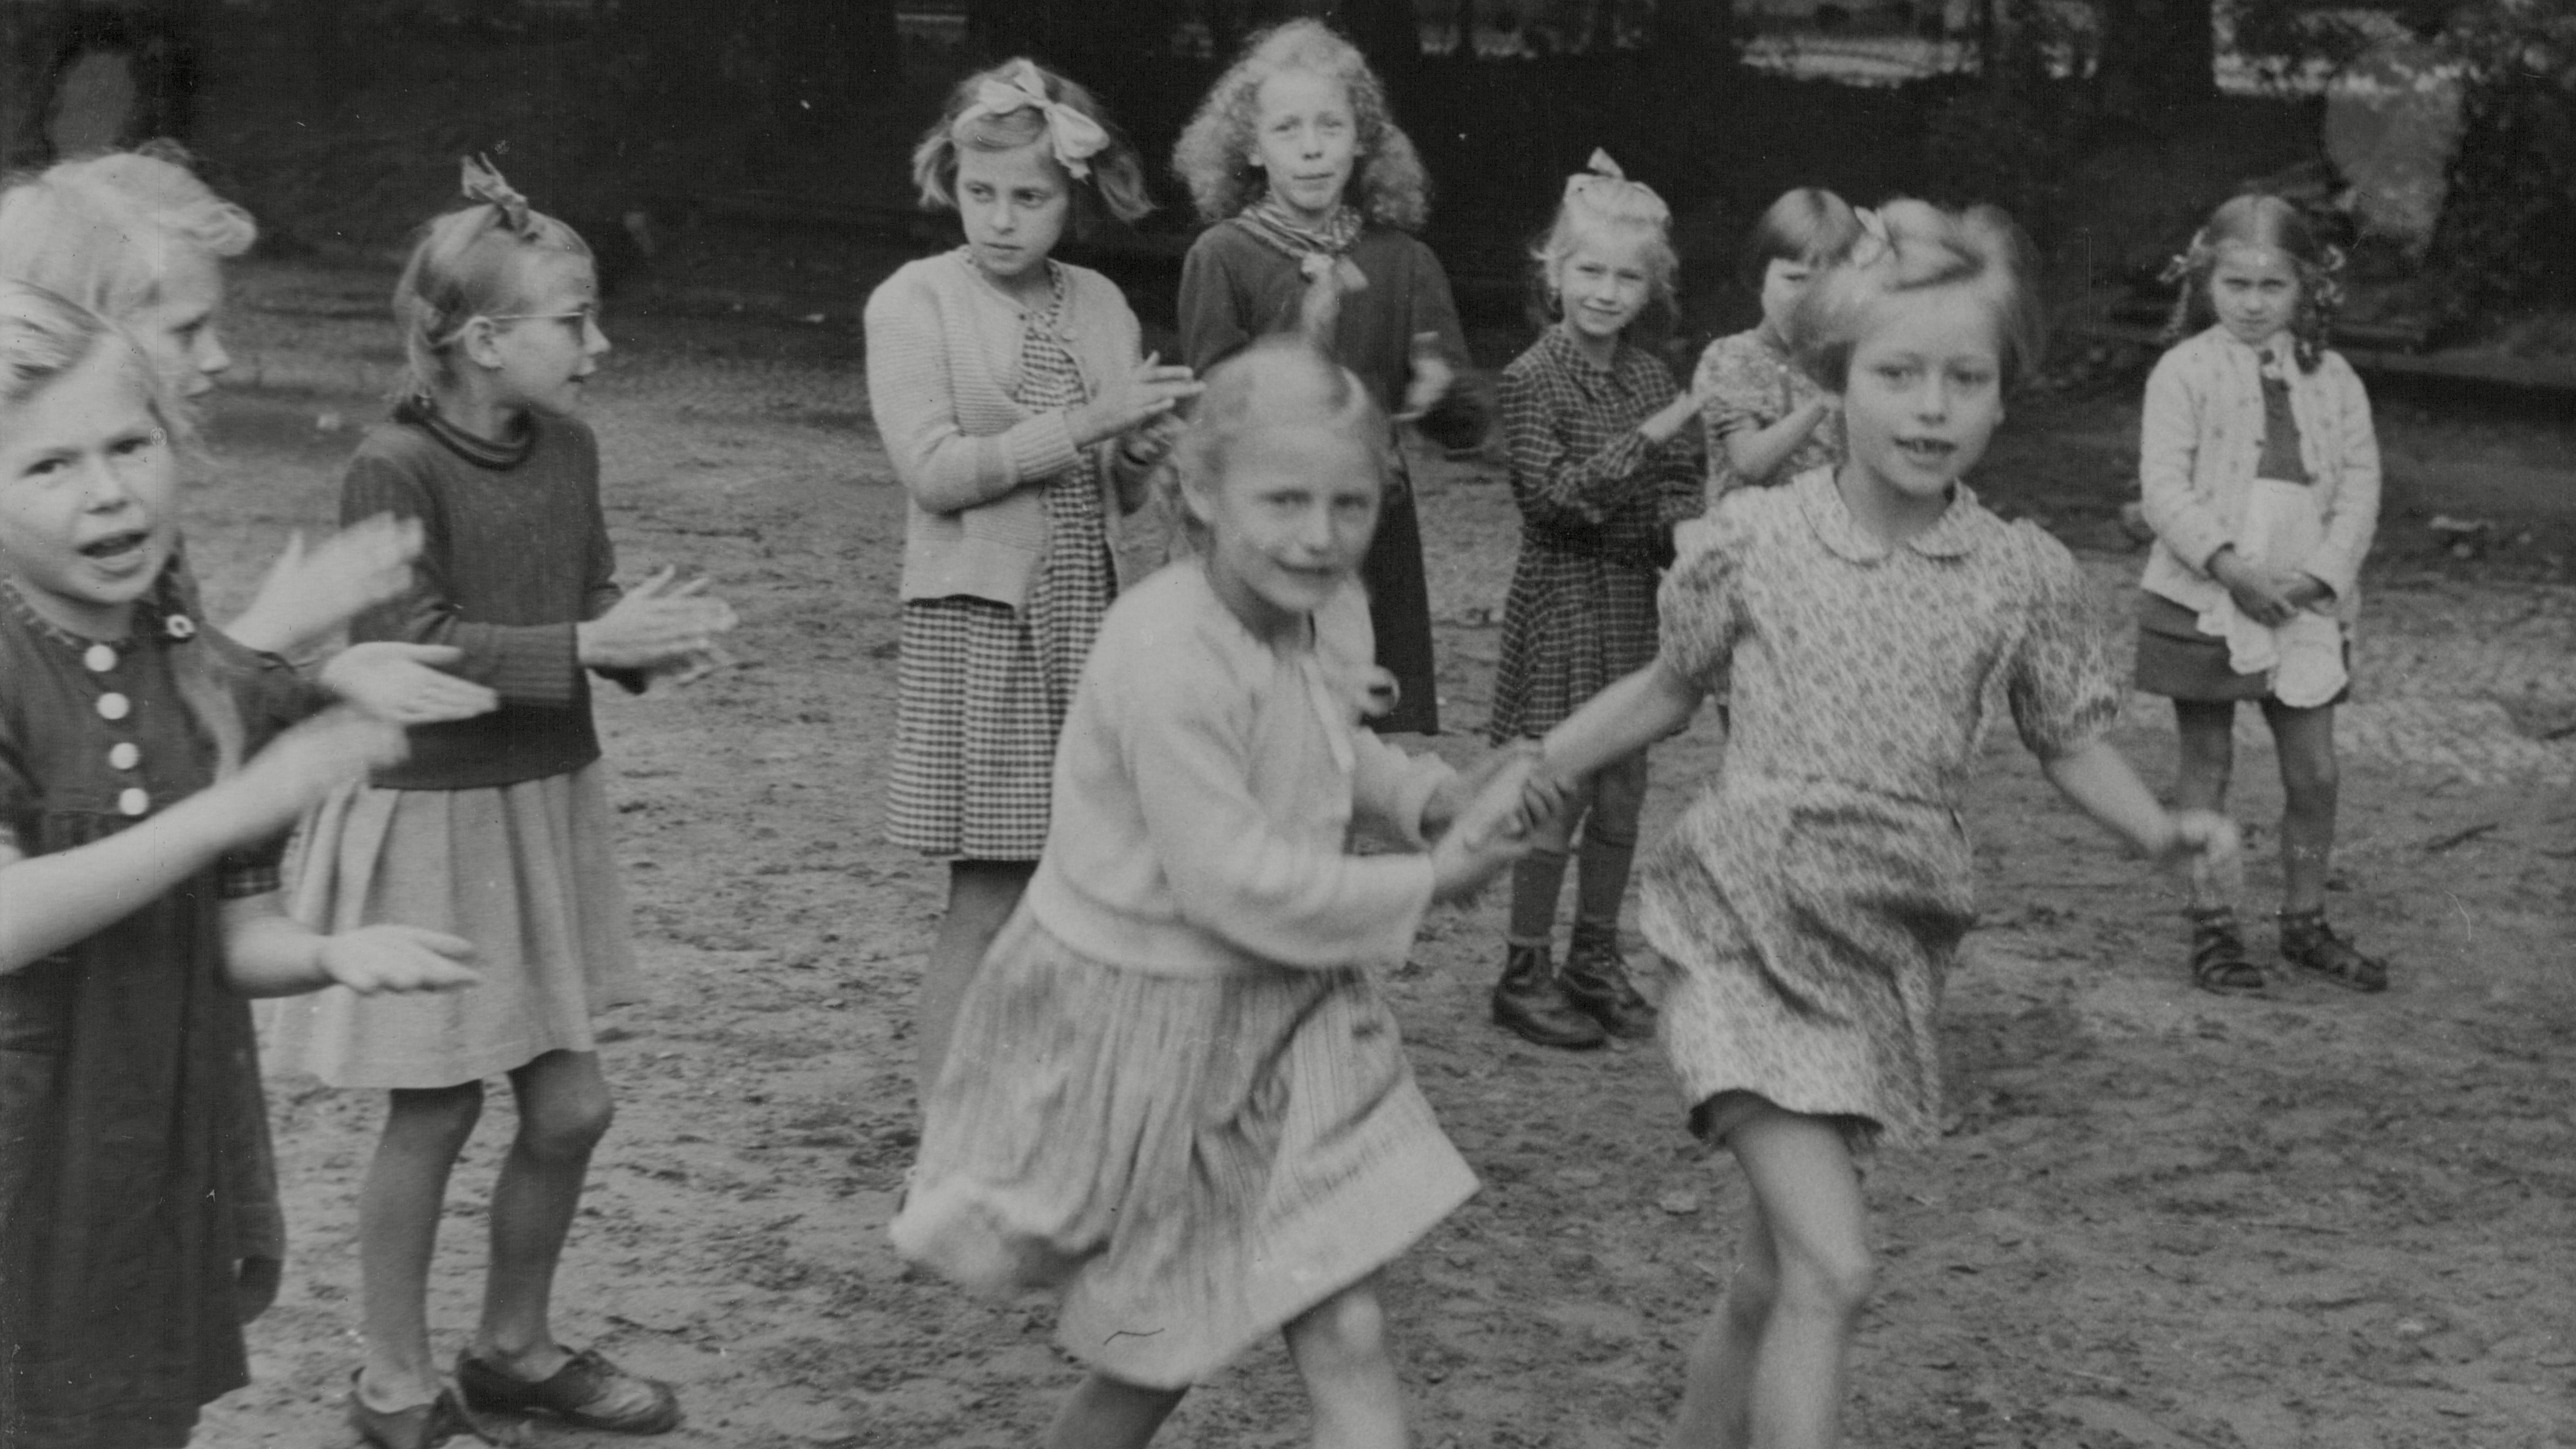 children playing, 1945